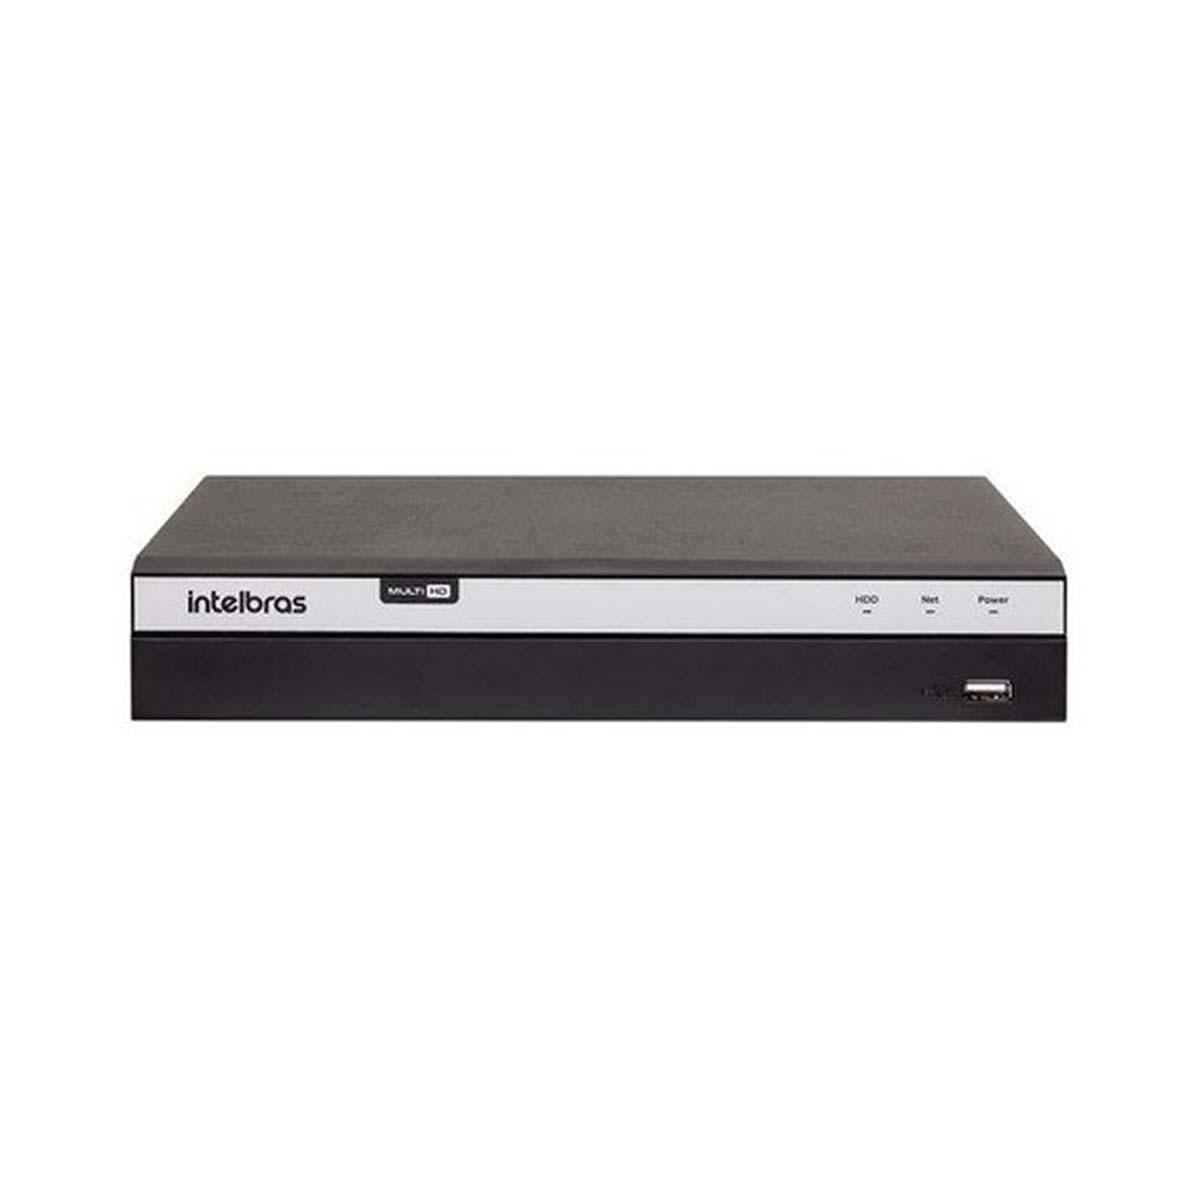 STAND ALONE INTELBRAS DVR 16 CANAIS MHDX 3116